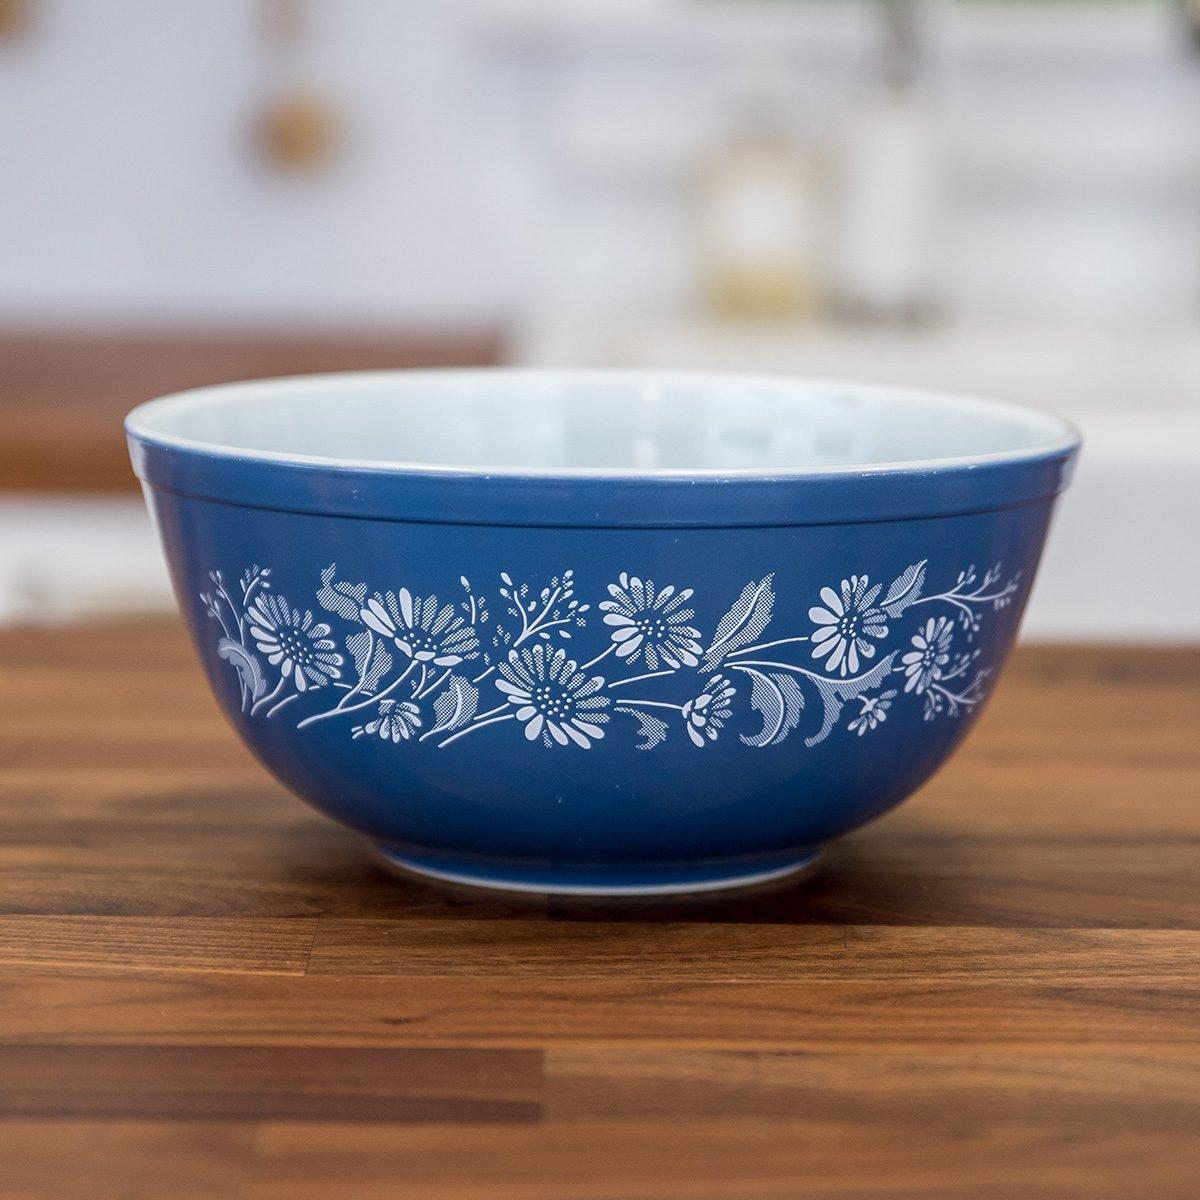 Vintage Pyrex bowl in Colonial Mist